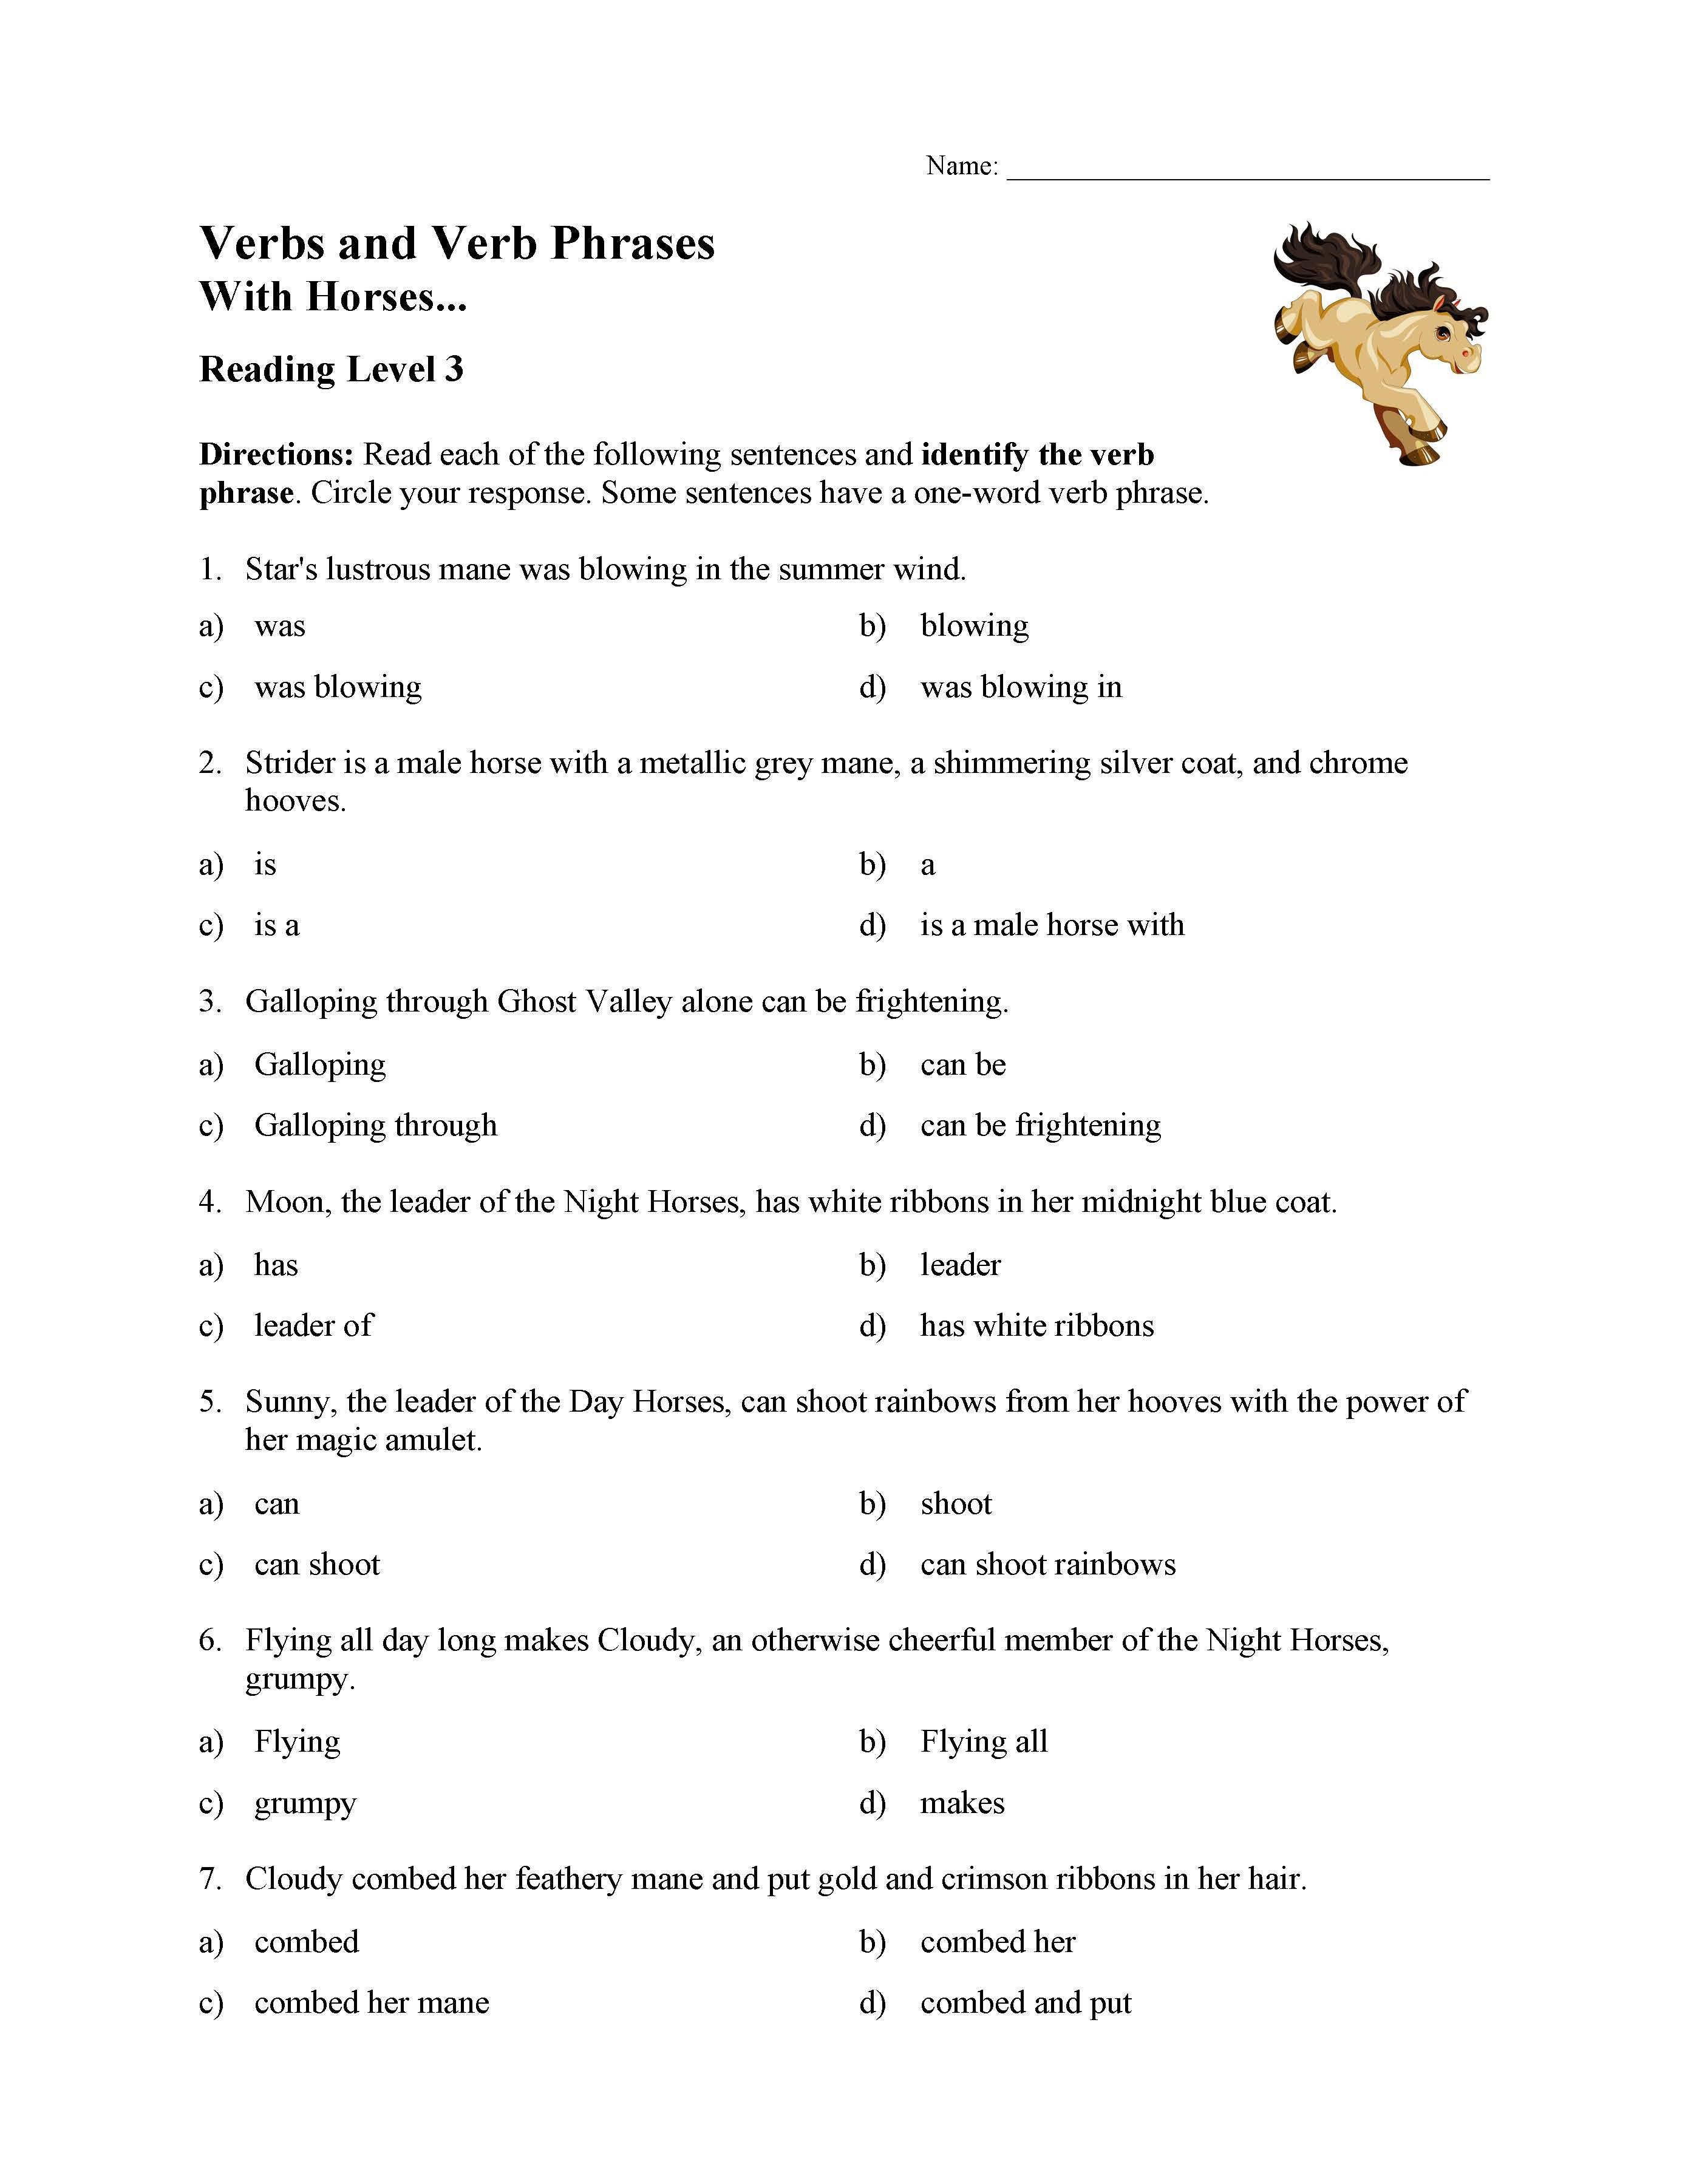 Verb Phrases Test